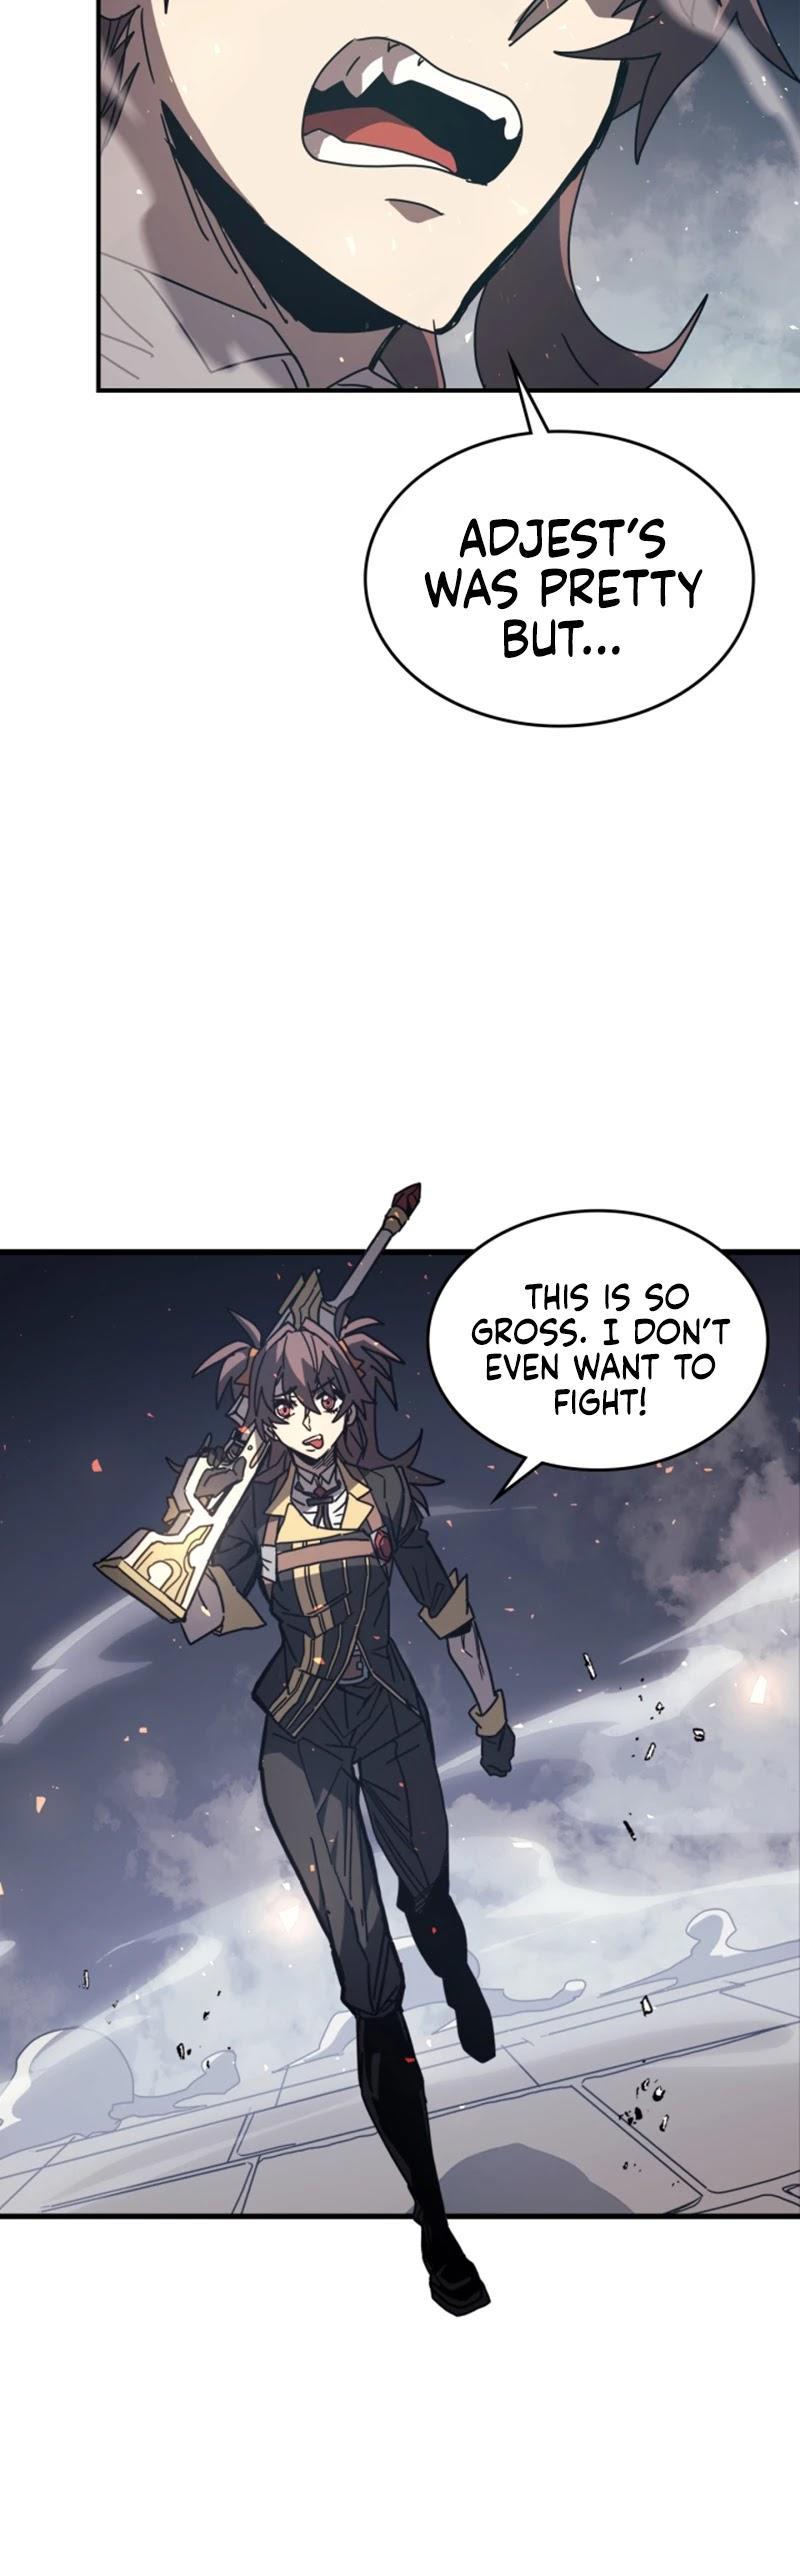 A Returner's Magic Should Be Special Chapter 161 page 37 - Mangakakalot